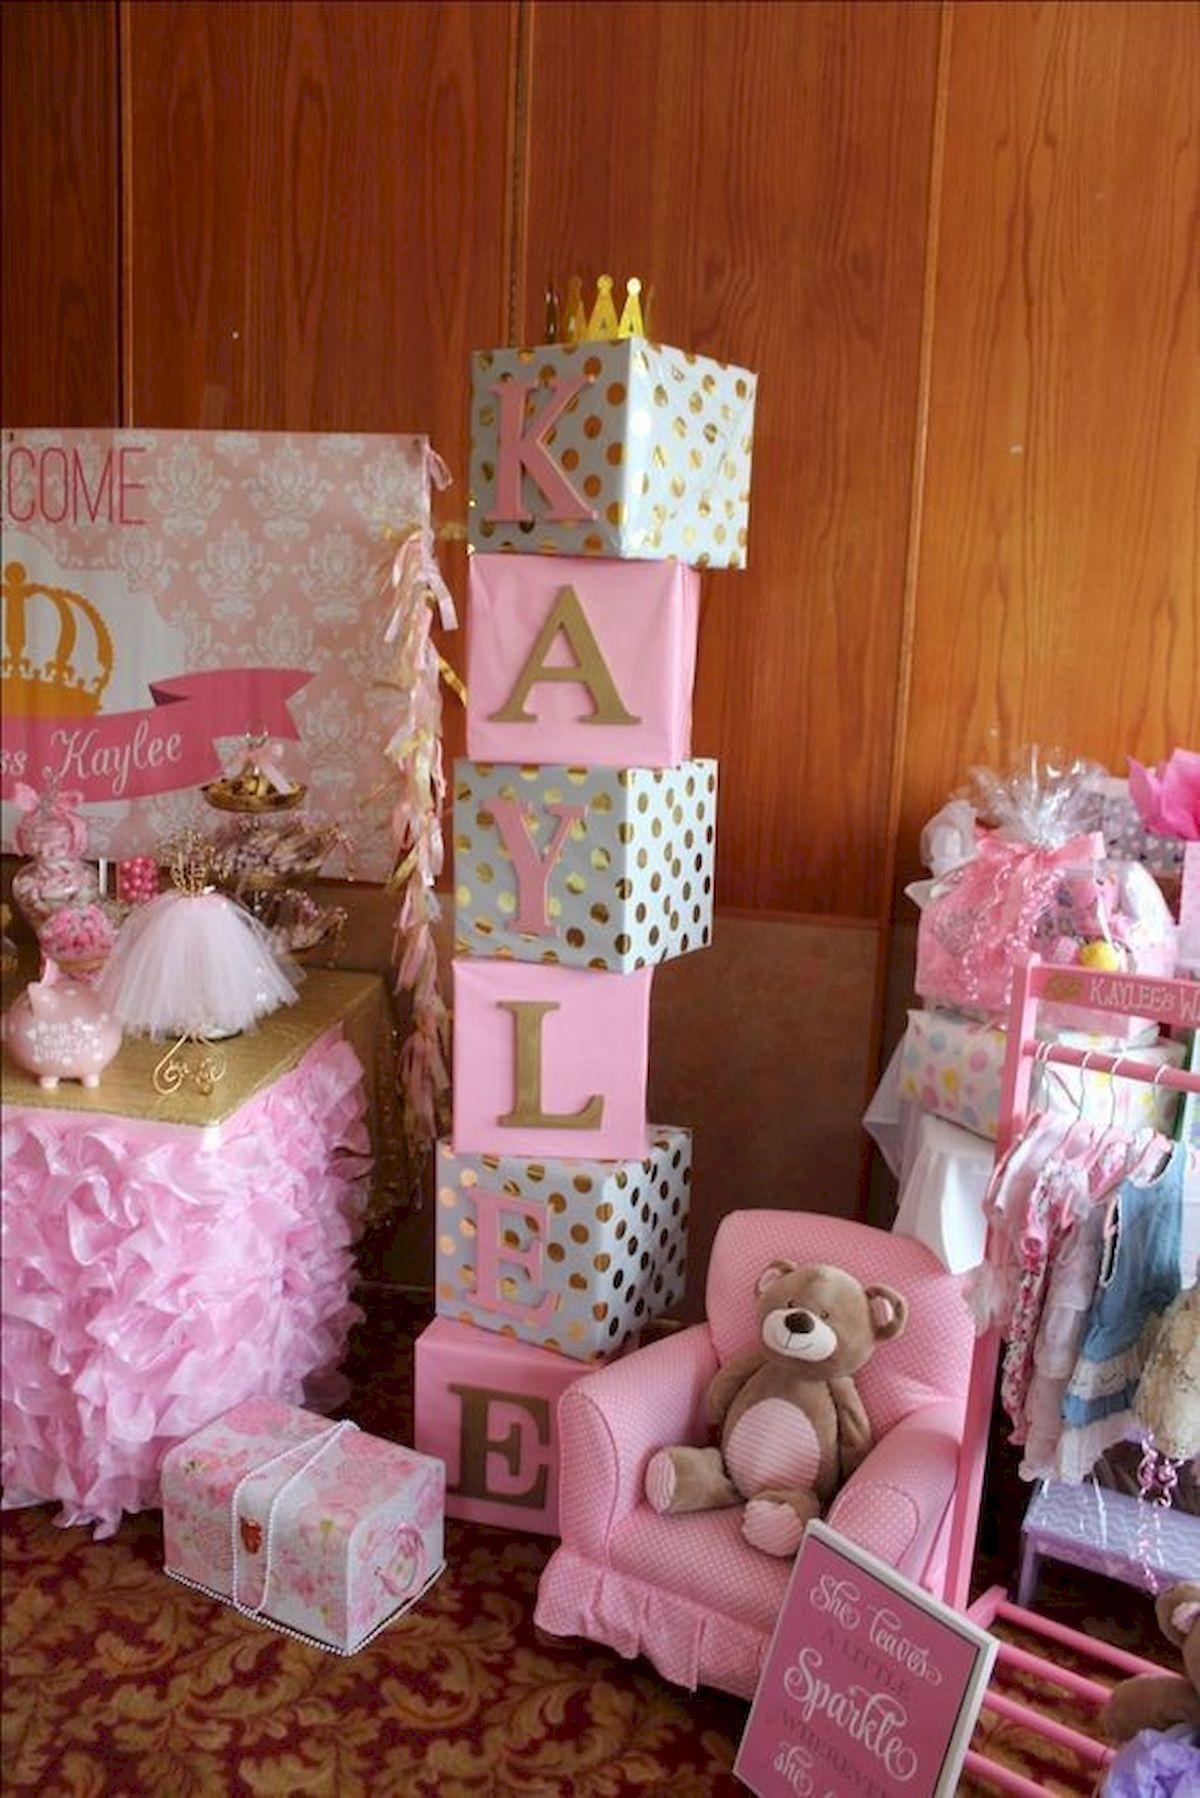 50 Cute Baby Shower Themes And Decorating Ideas For Girls 3 Babyshoweroso Unicornbabyshower Baby Shower Themes Girl Baby Shower Decorations Baby Shower Diy